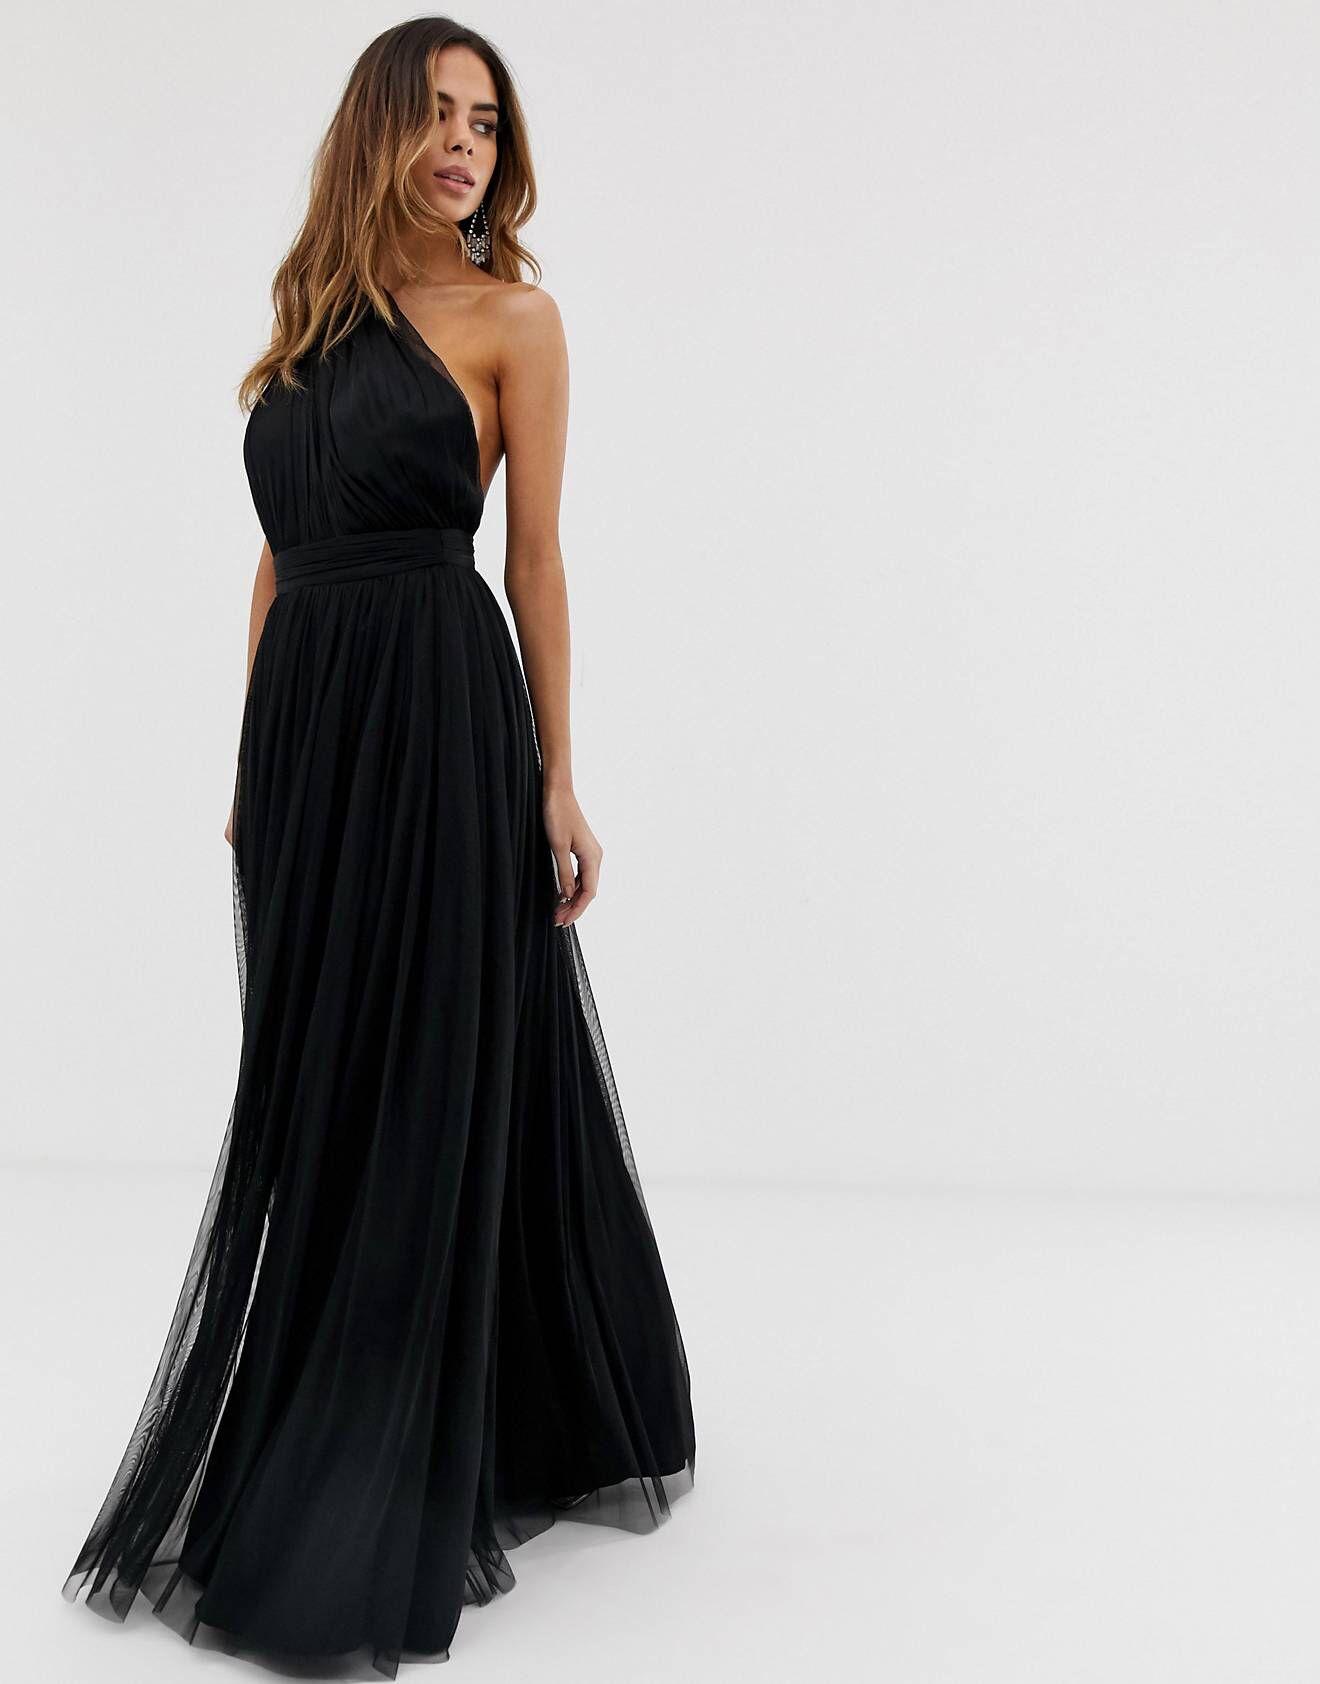 Pin By Jasmine Tan On Ac Wedding Tulle Maxi Dress Long Sleeve Cocktail Dress Maxi Dress Trend [ 1684 x 1320 Pixel ]